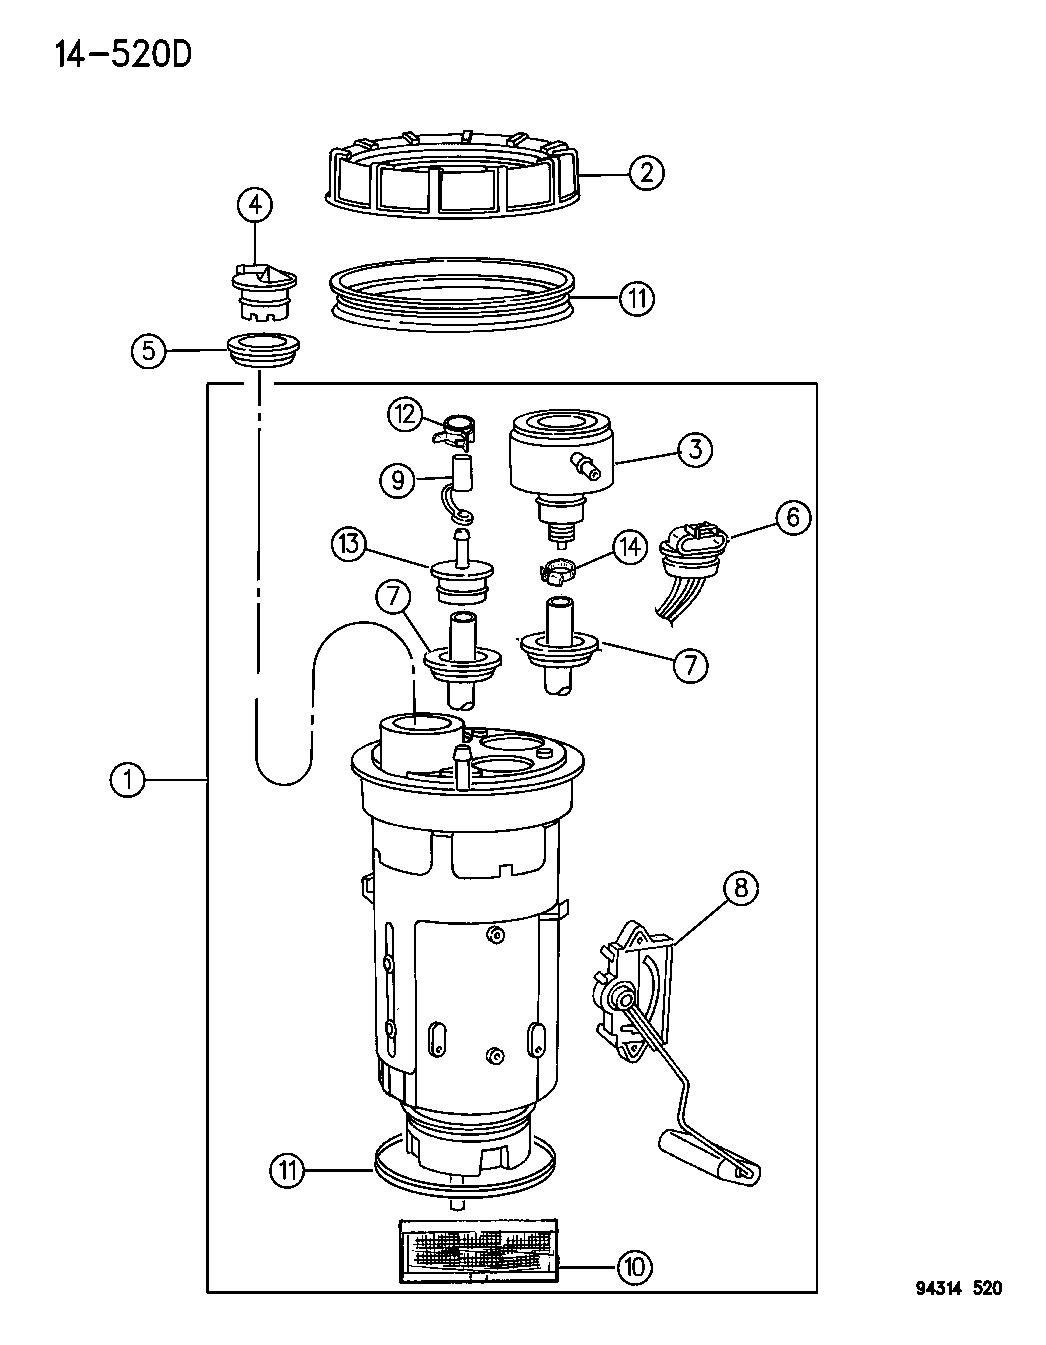 pump fuel Dodge Ram Parts Diagram 1996 dodge ram 1500 fuel module, level unit and filter